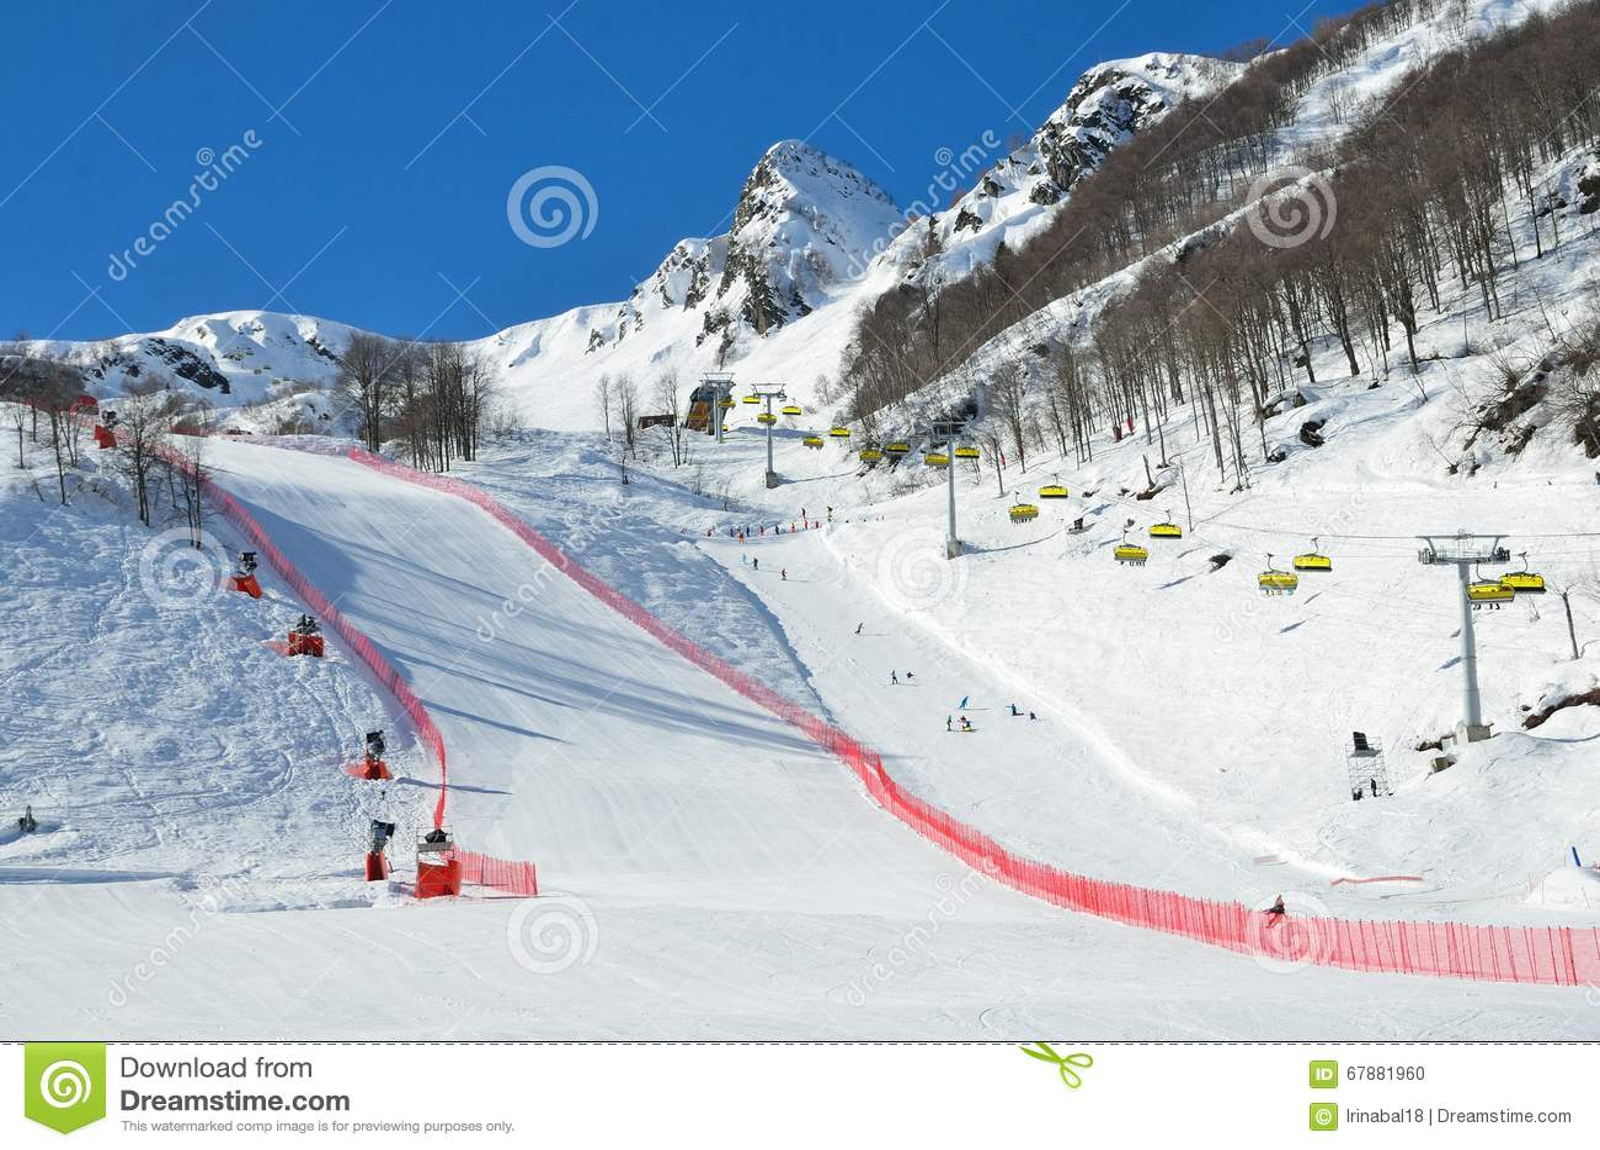 La Russie, Sotchi, les pentes de la station de sports d hiver Rosa Khutor